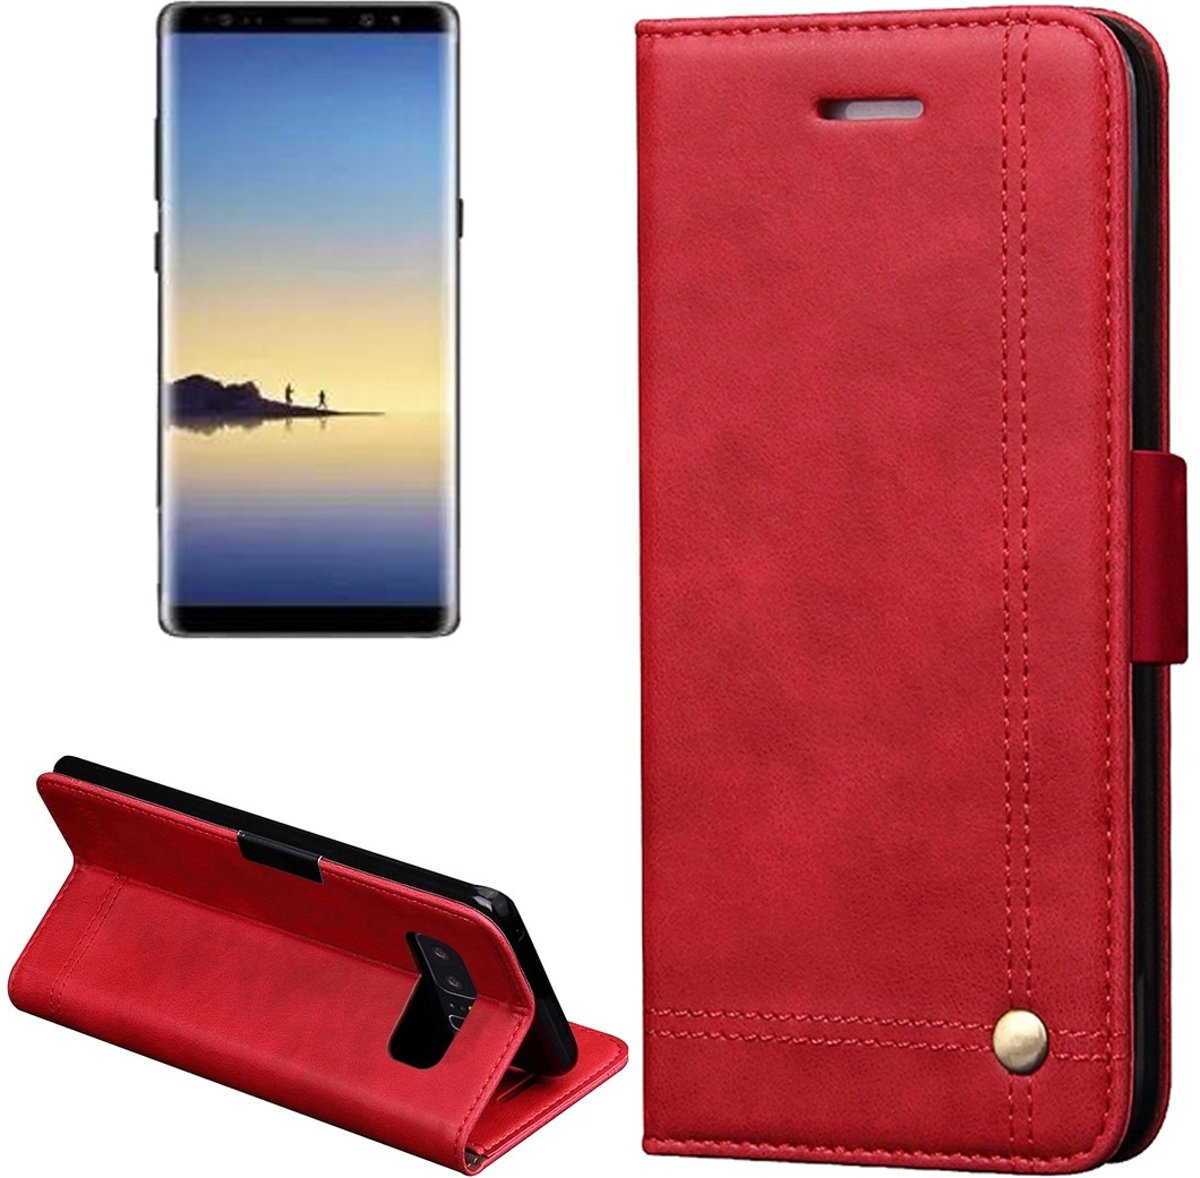 Tuff-luv - Faux leren book-stand case voor de Samsung Galaxy note 8 - rood